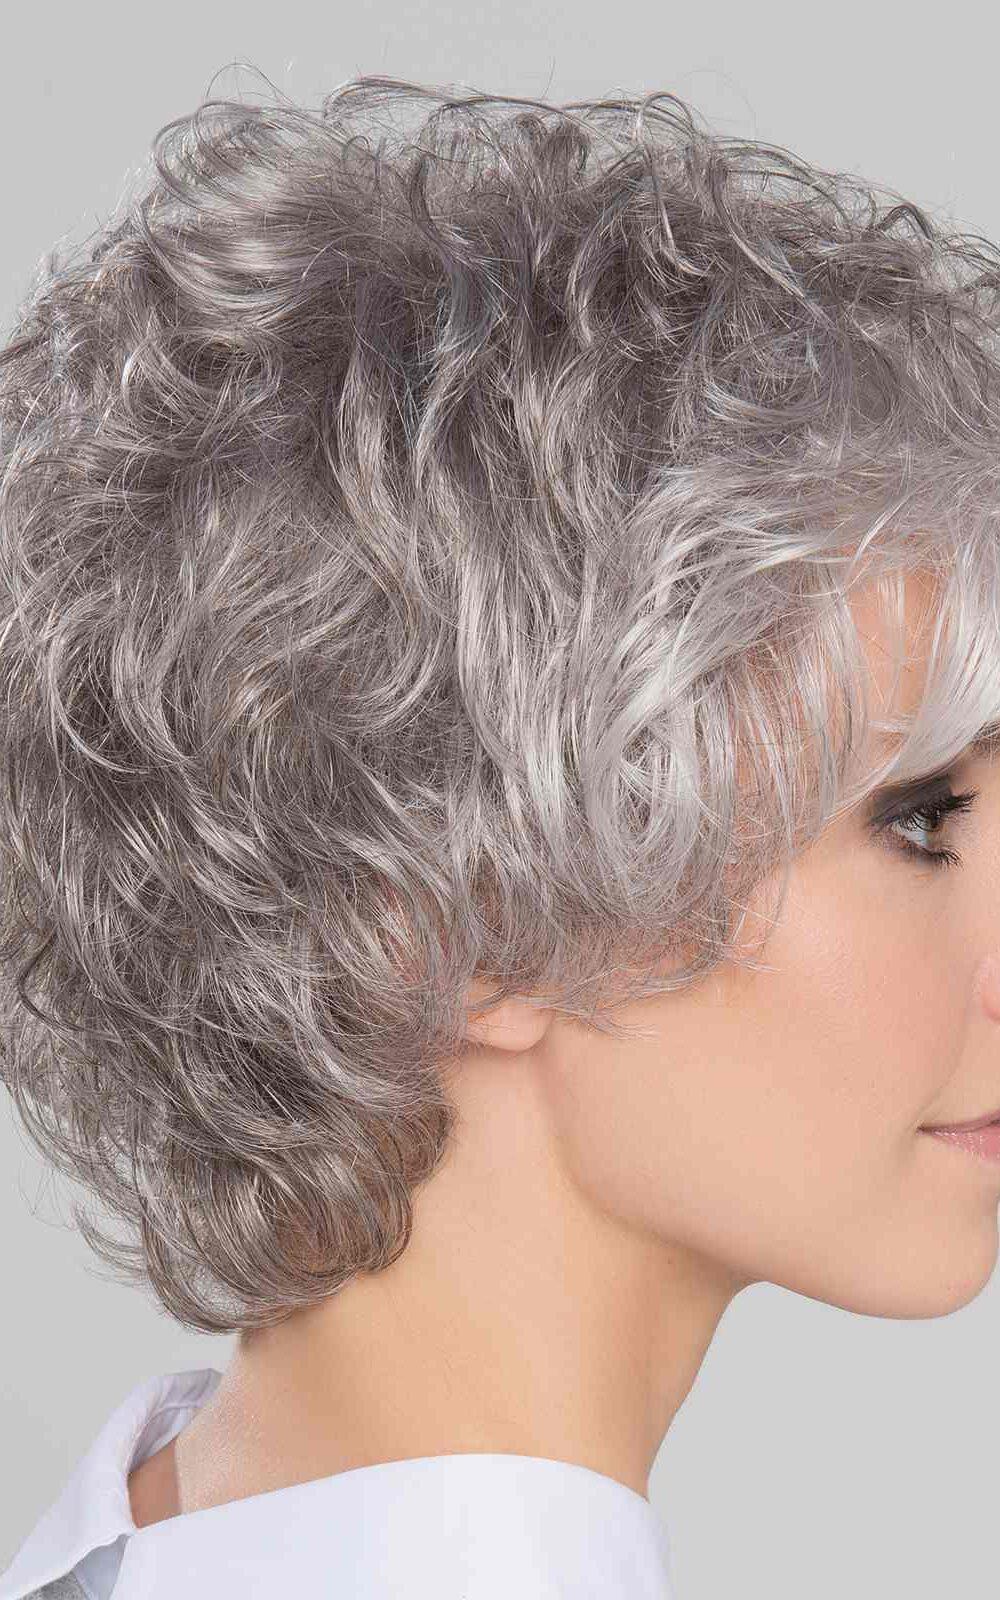 City   Approximate Hair Length: Fringe: 4.75